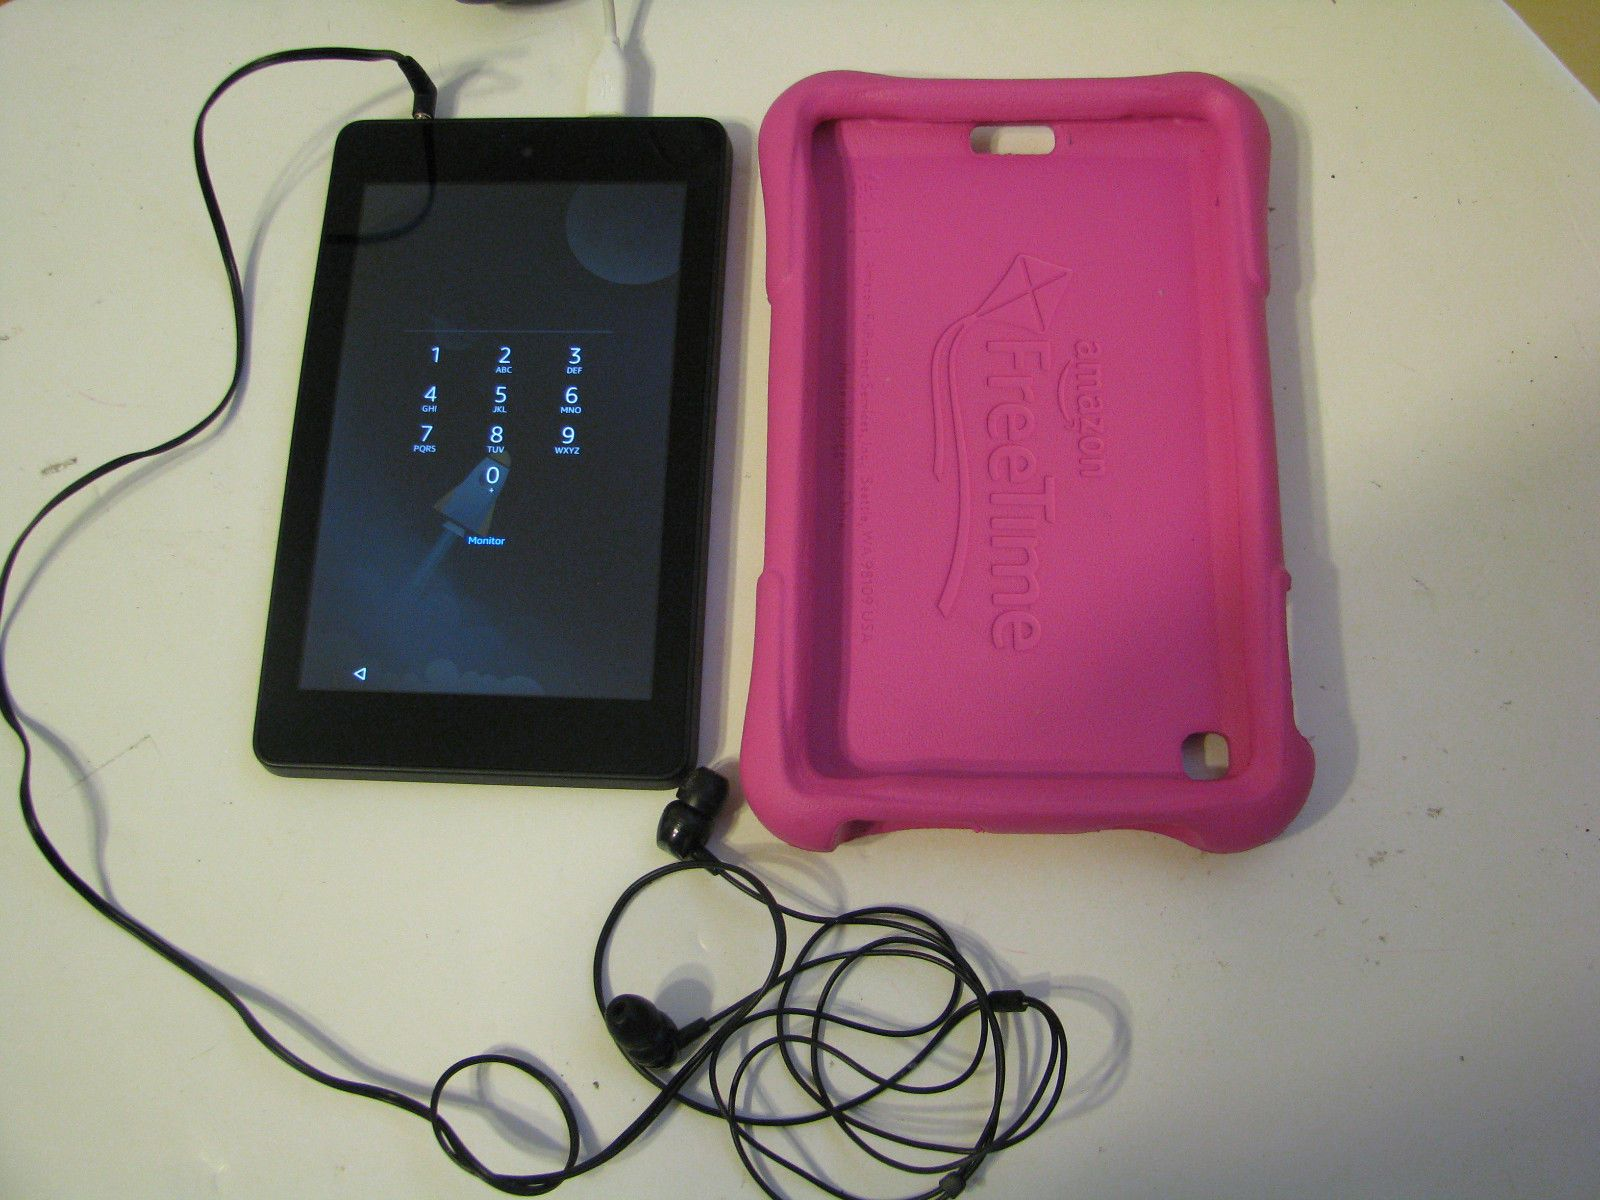 Amazon Kindle Fire HD 6'' PW98VM  Wi-Fi Tablet Black  https://t.co/fLXp8pi9ZO https://t.co/ntIzbBKgTa